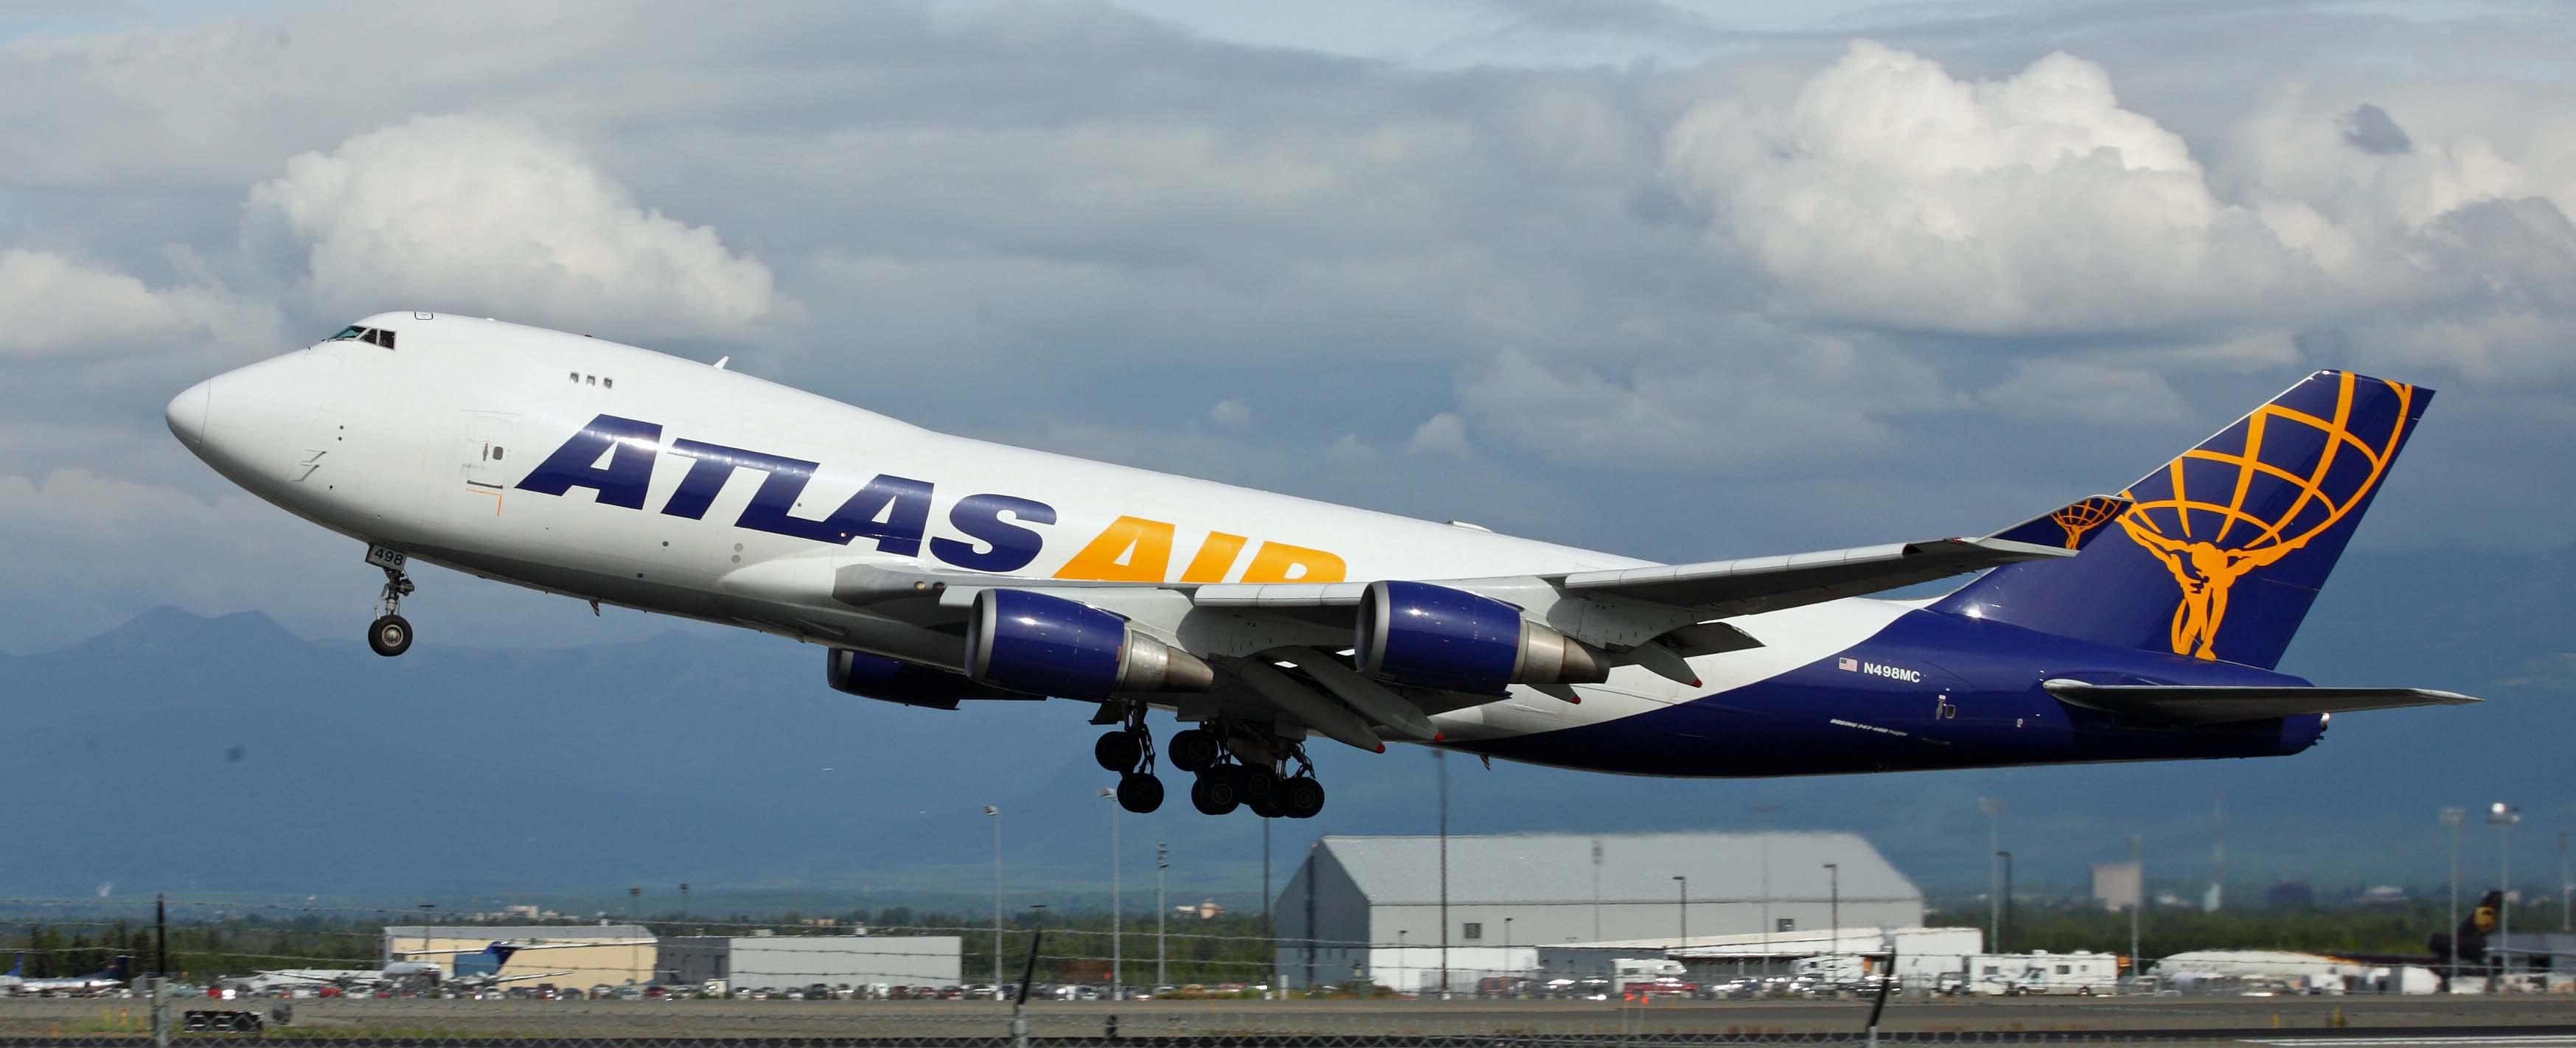 Air Travel While Pregnant Safe